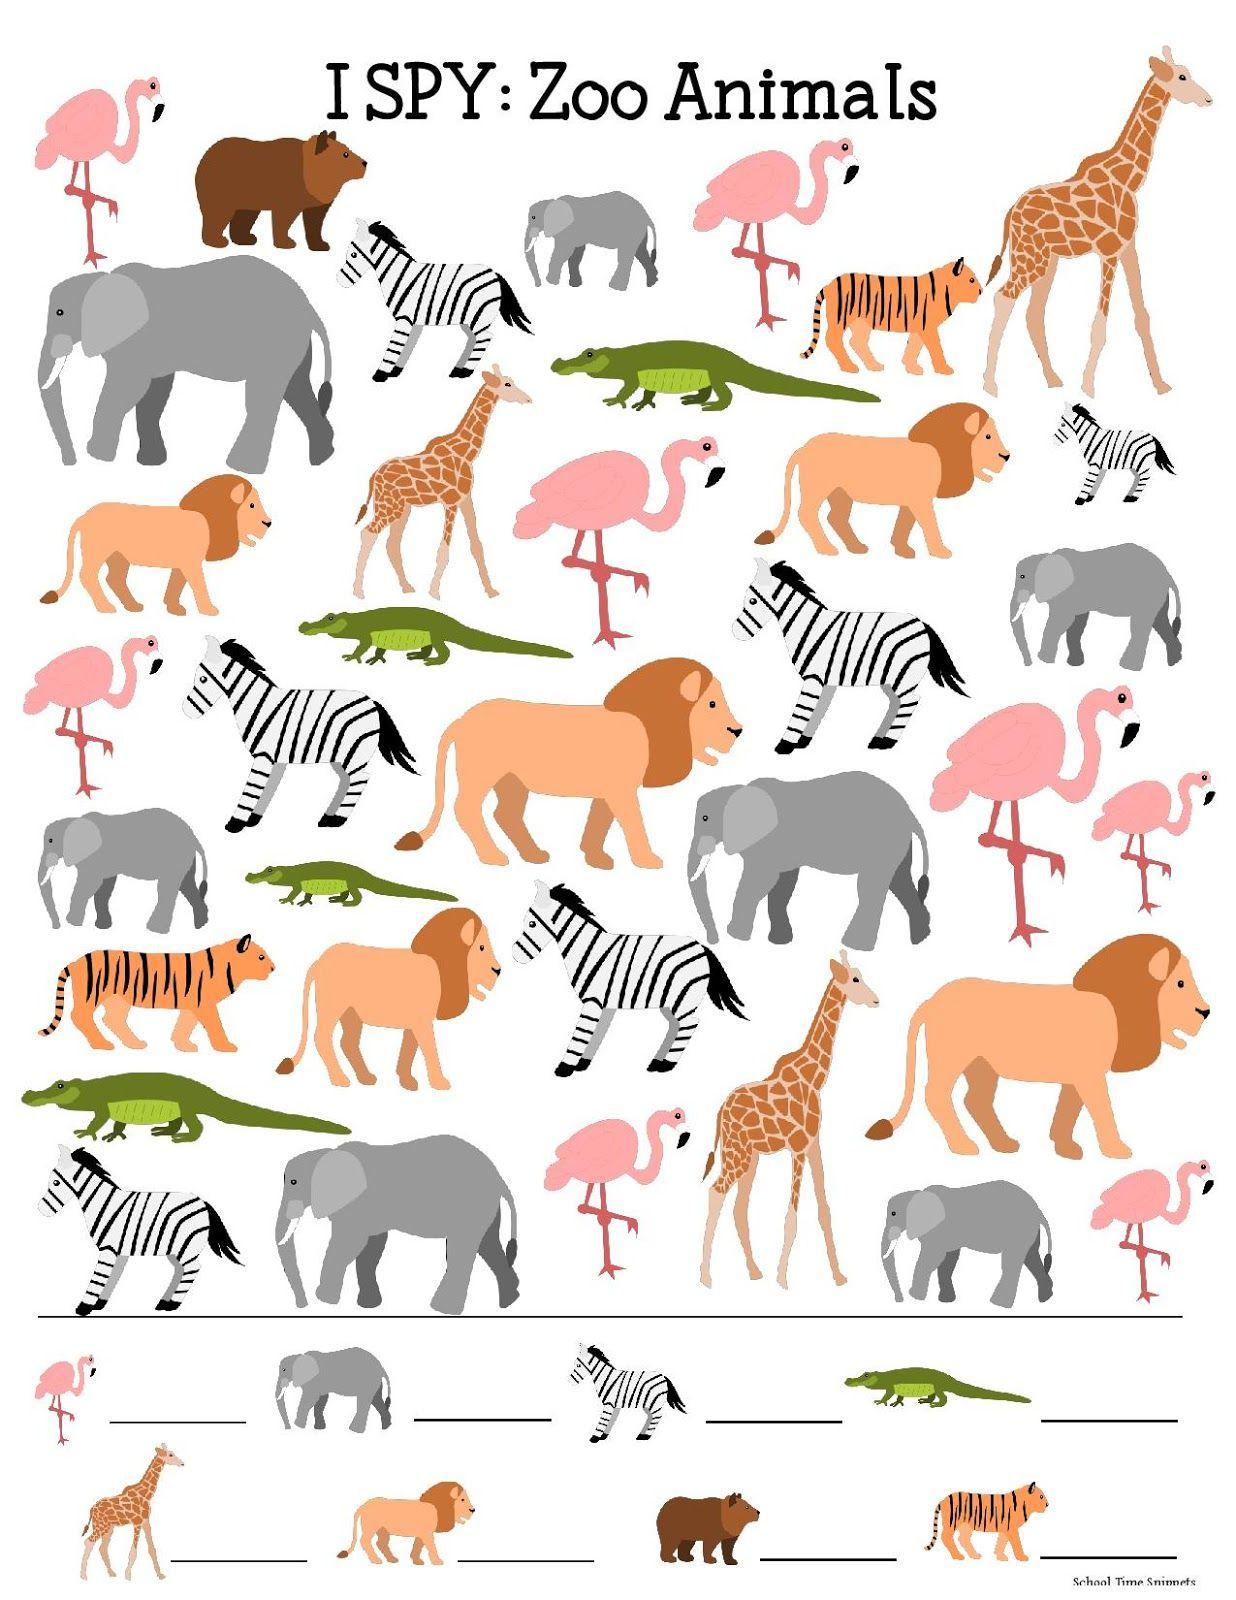 Zoo Theme I Spy Printable | Zoo | Pinterest | Zoo Preschool, Zoo - Free Printable Zoo Worksheets